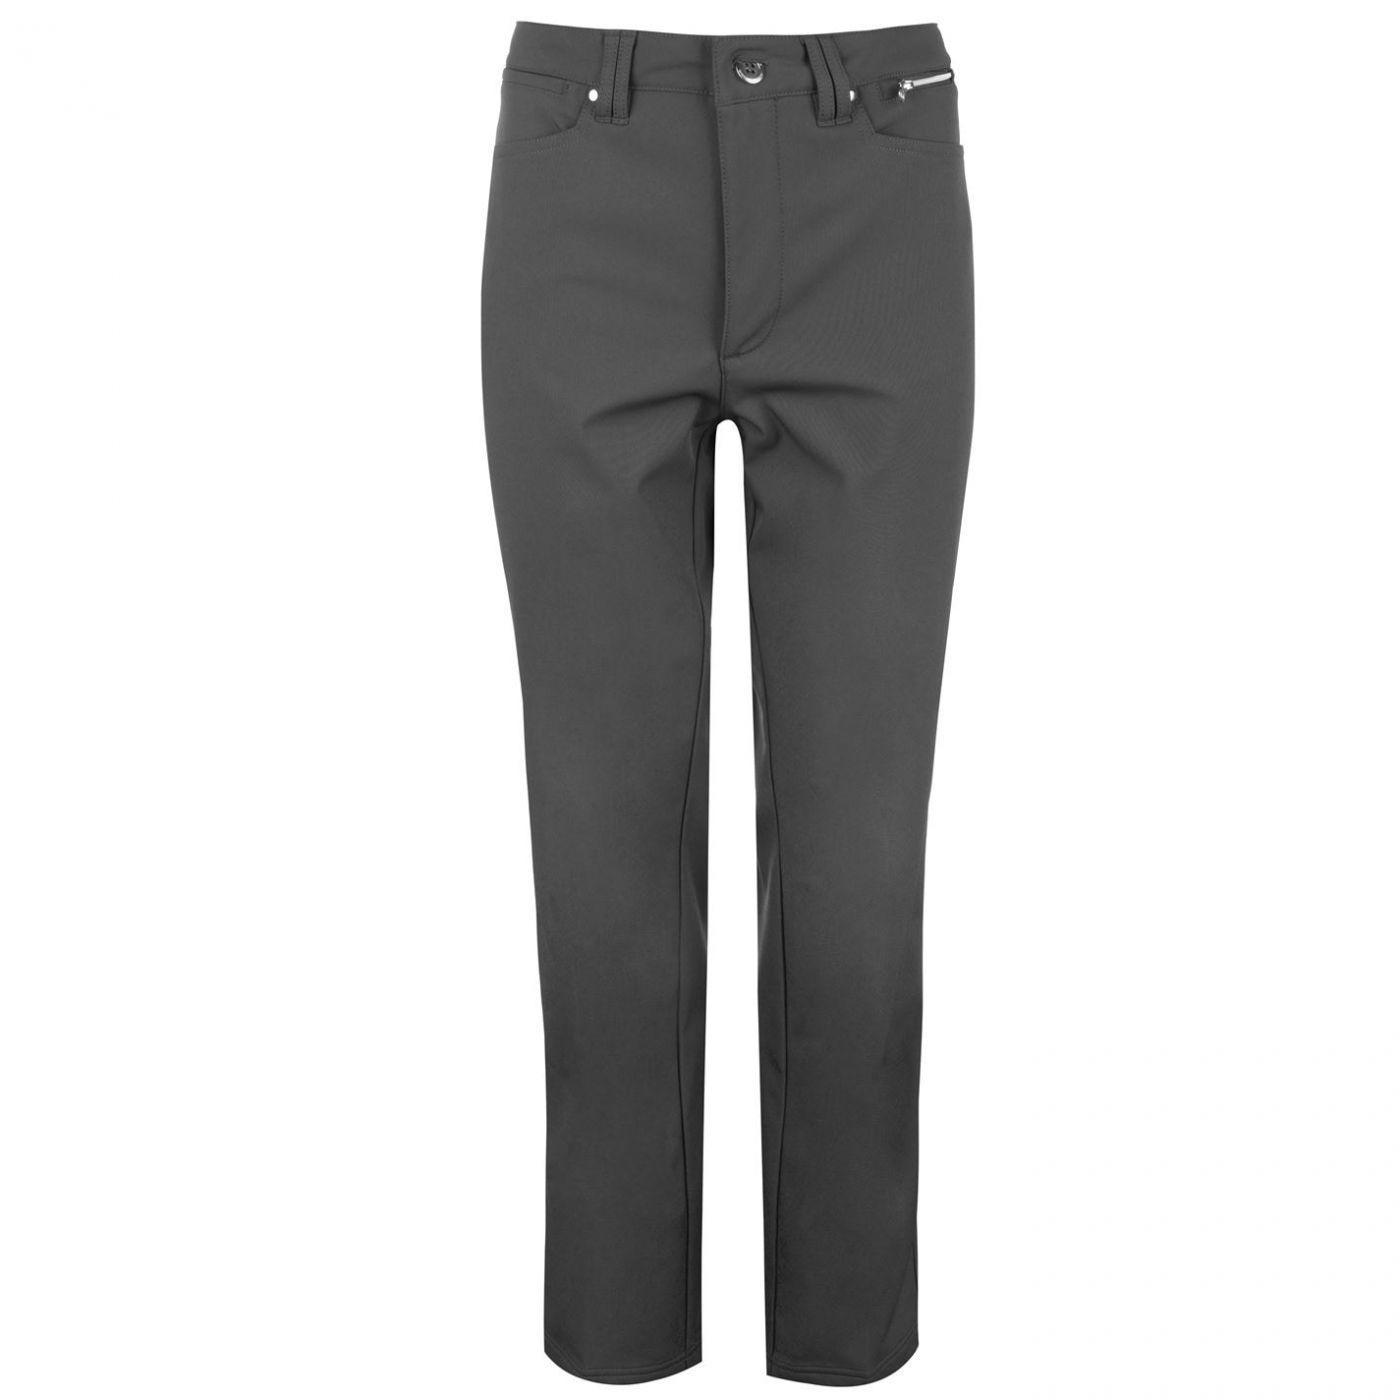 Slazenger Winter Golf Trousers Ladies